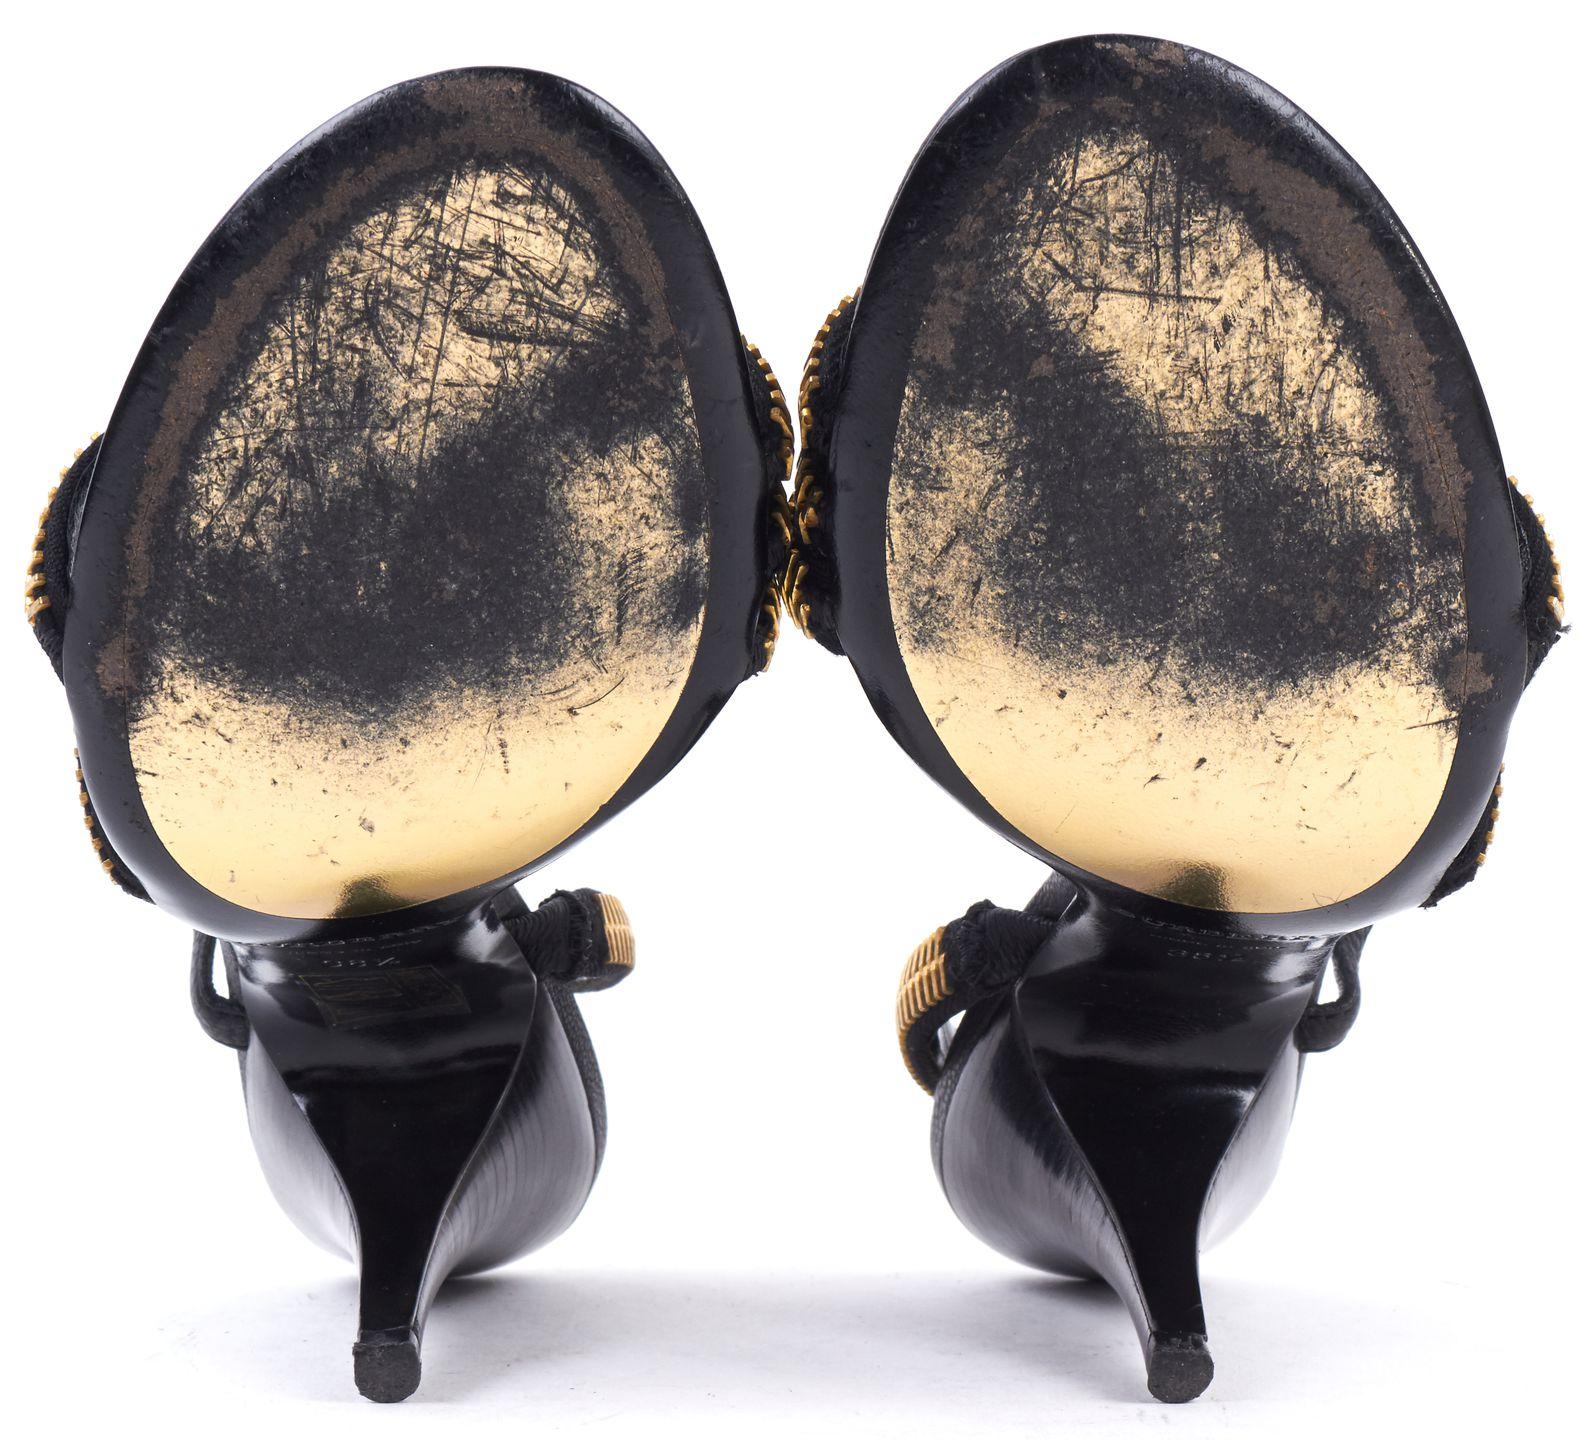 BURBERRY Black Leather Gold Zipper Detail Sandals